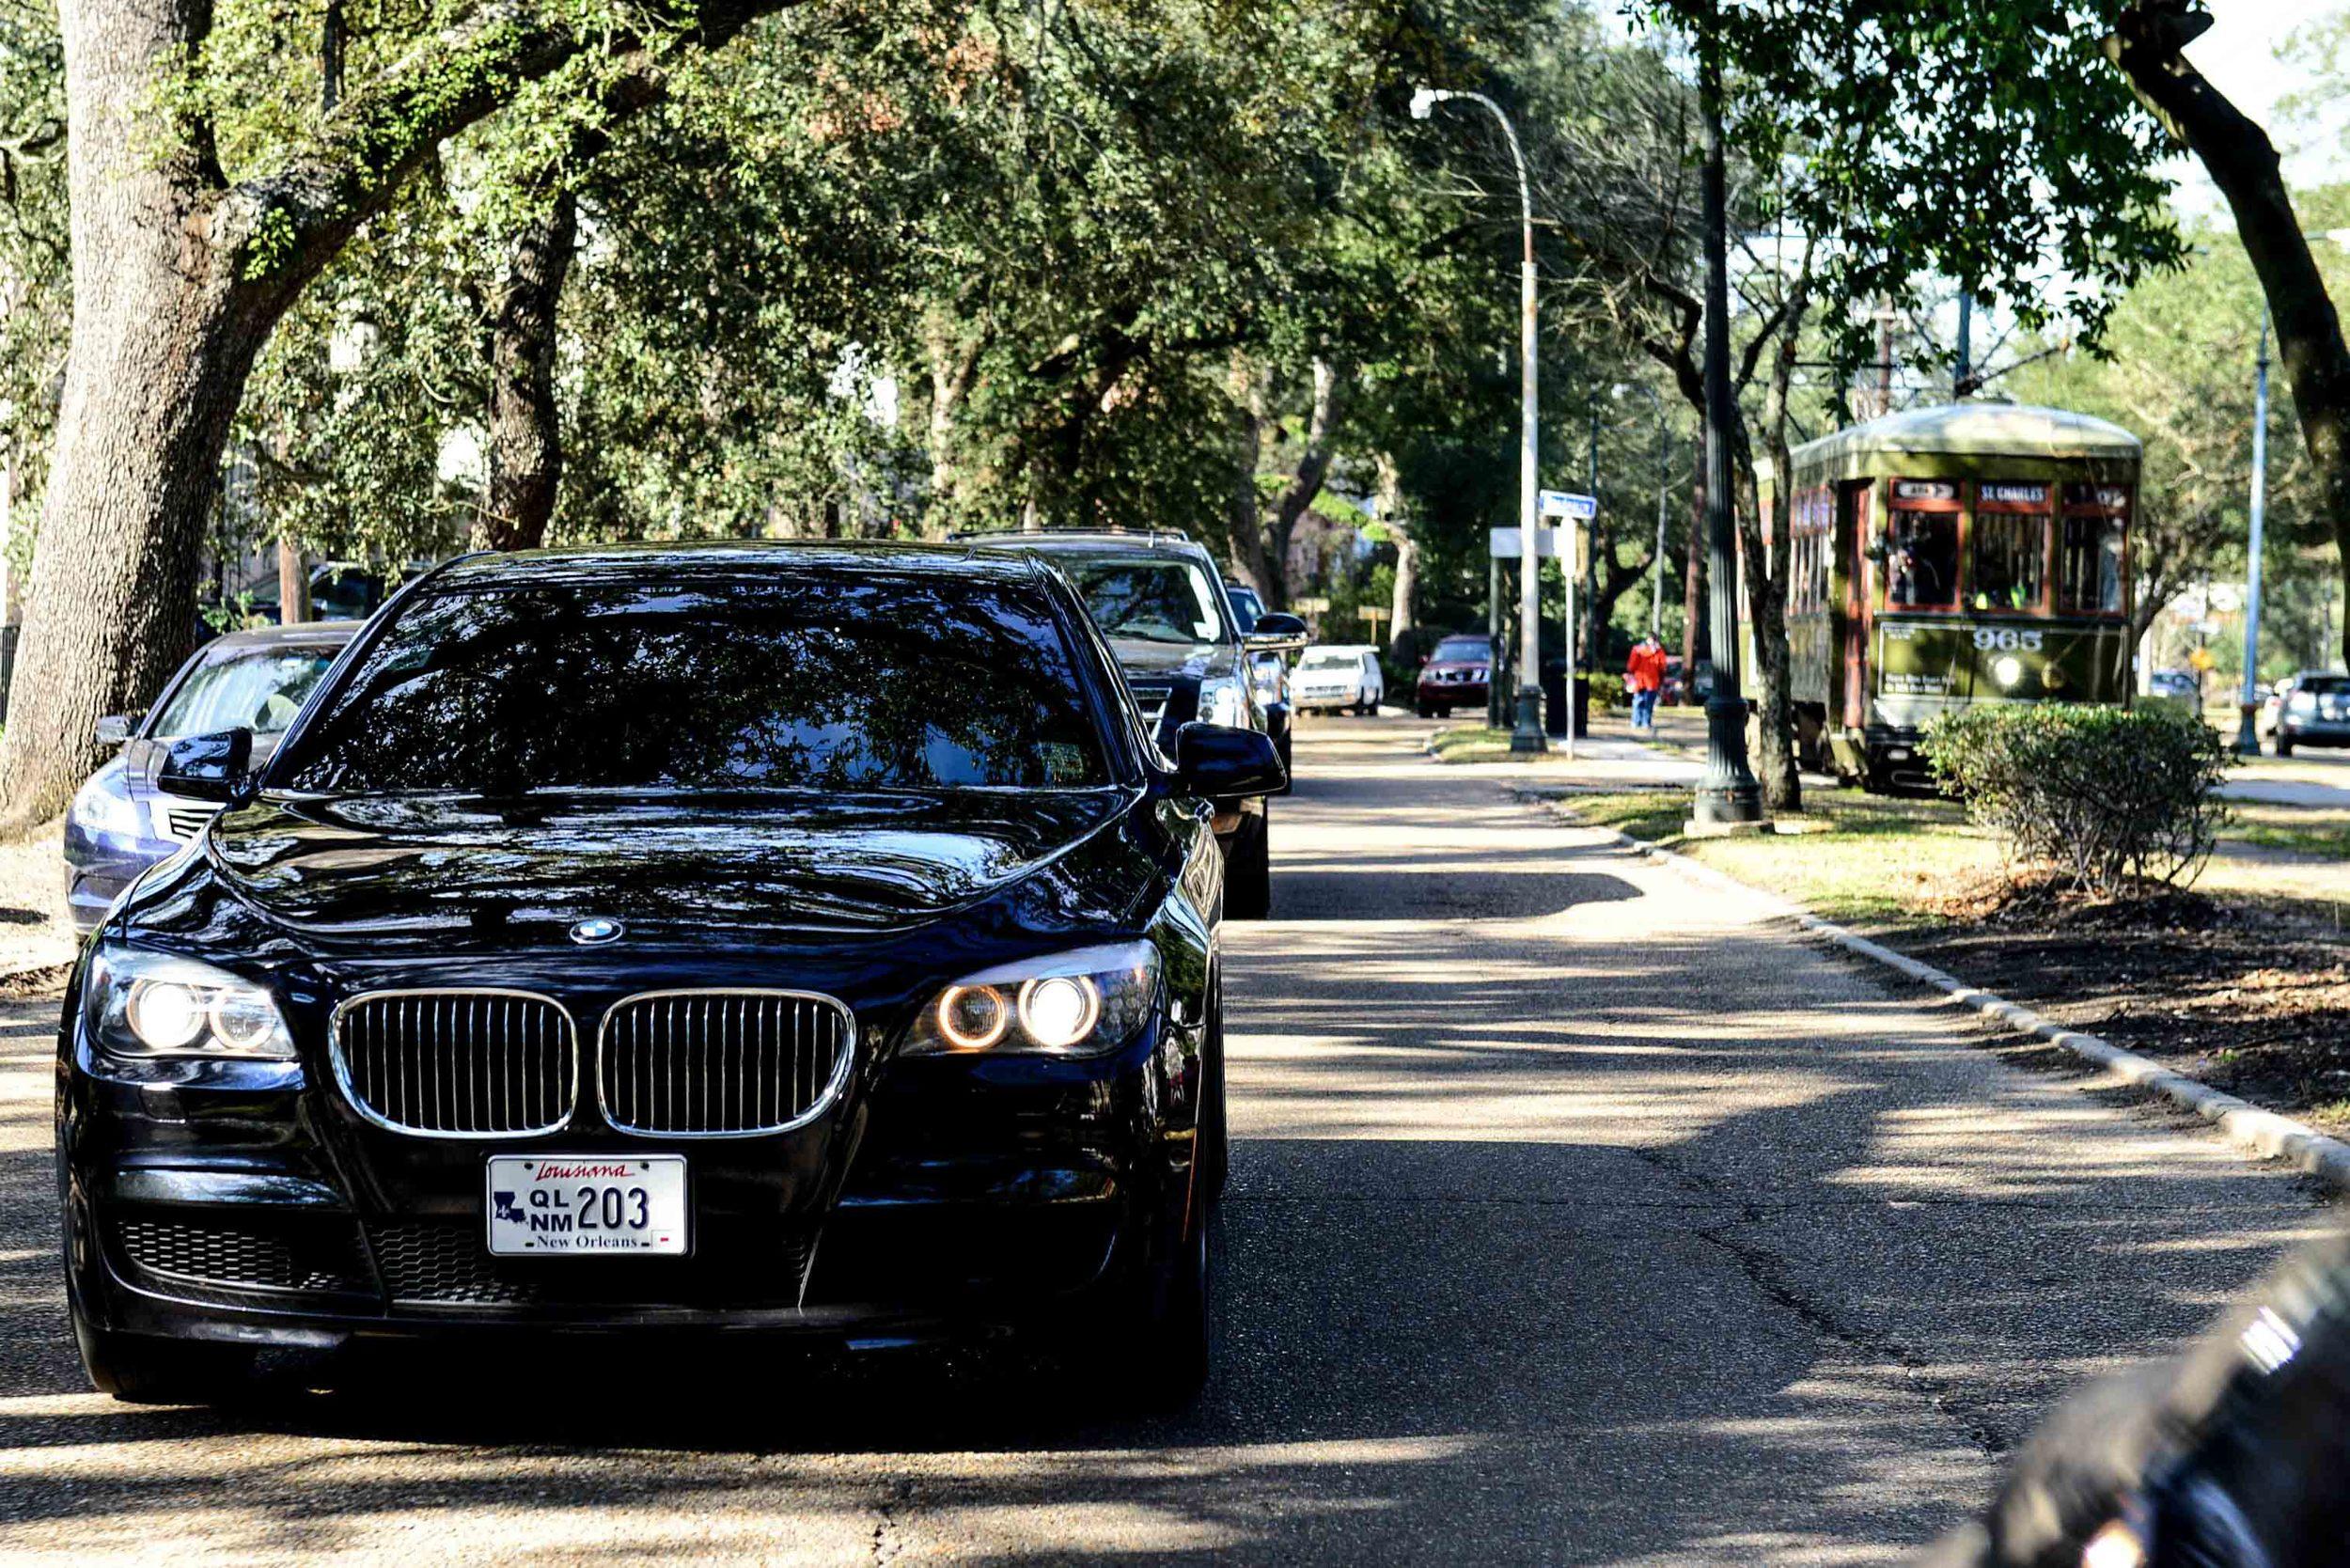 New Orleans Car Service_LCS_Fleet (40 of 43).jpg